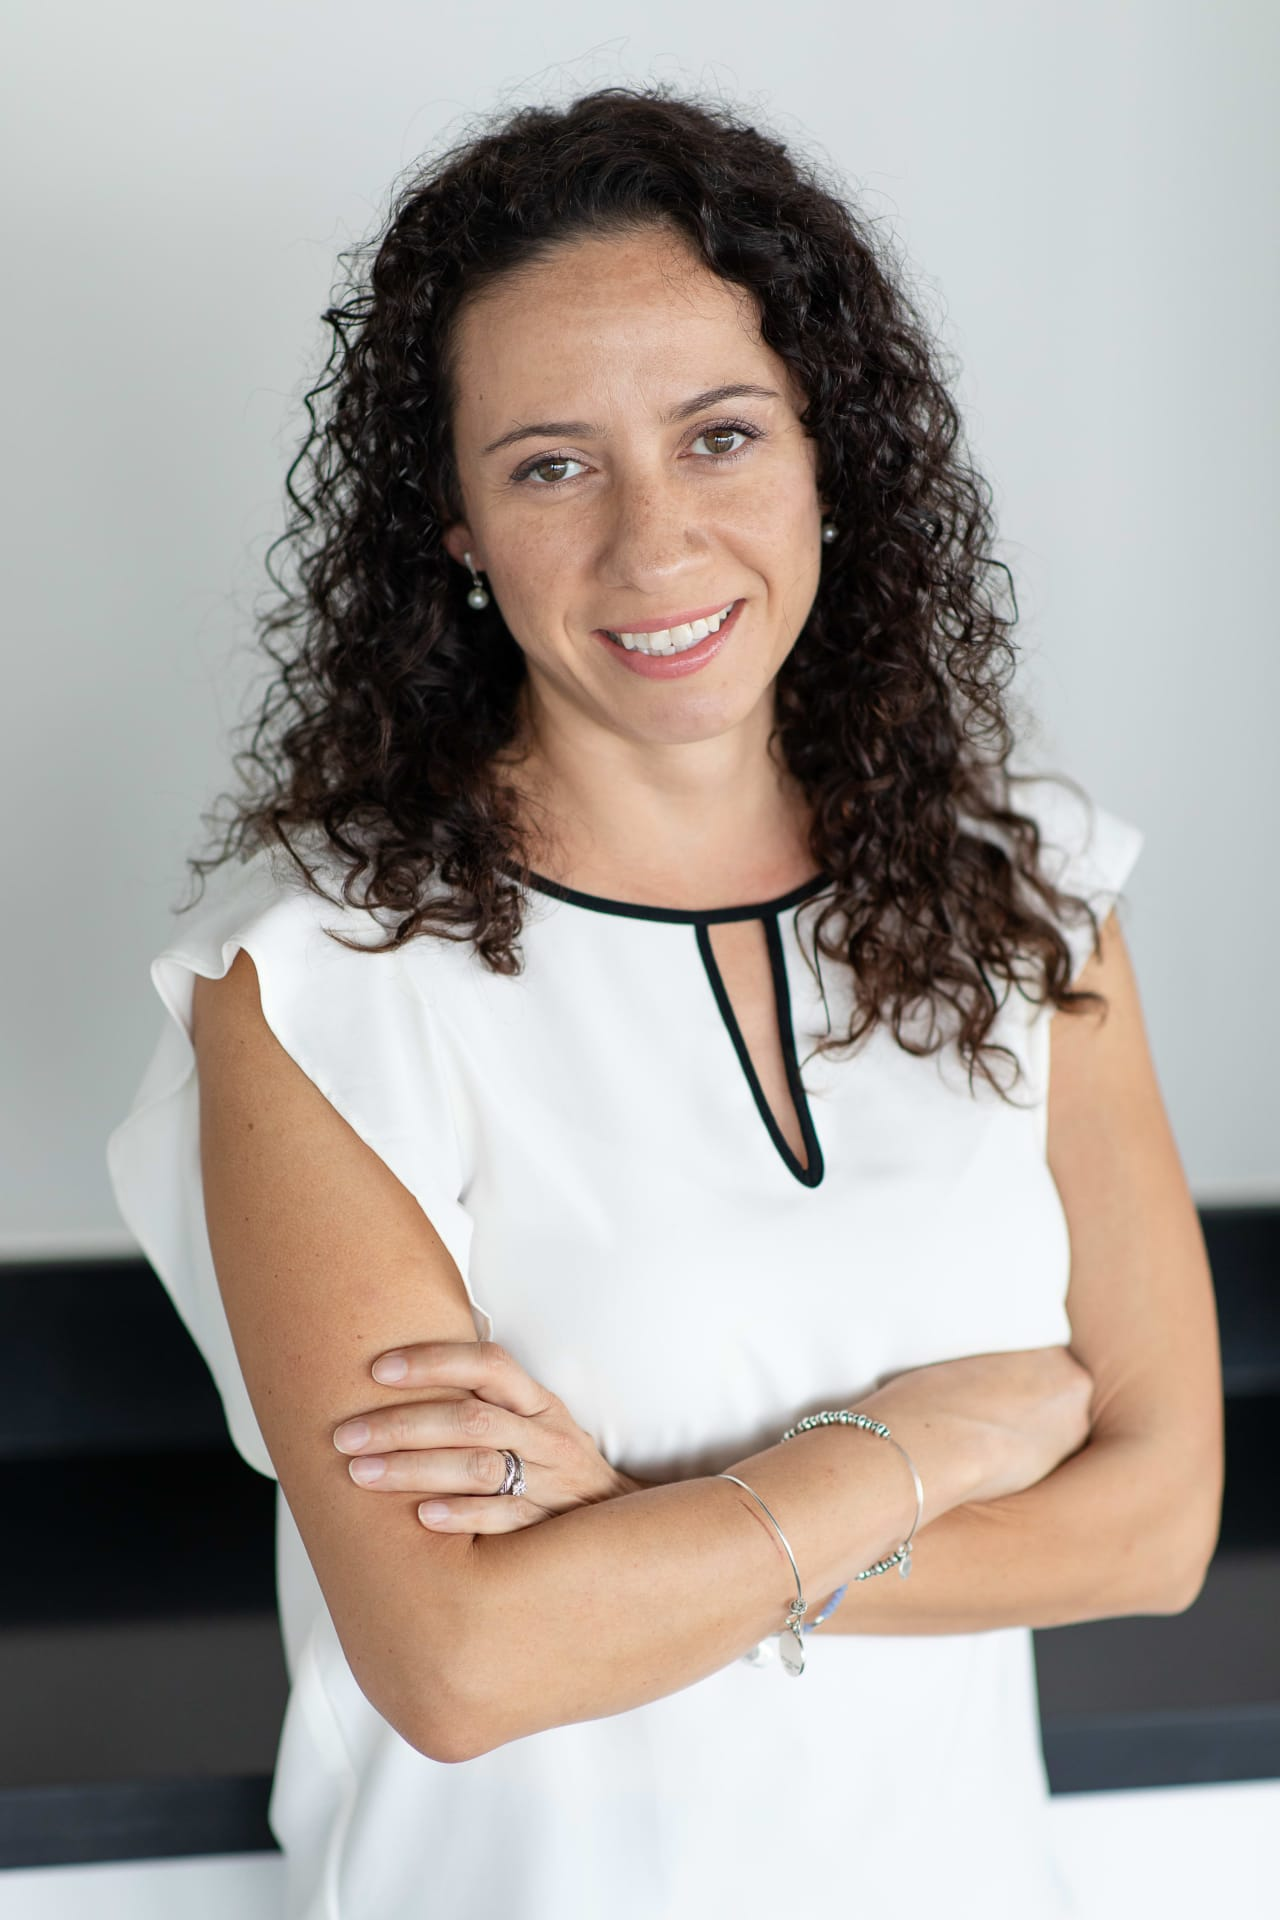 Claudia Villasana-Munoz photo